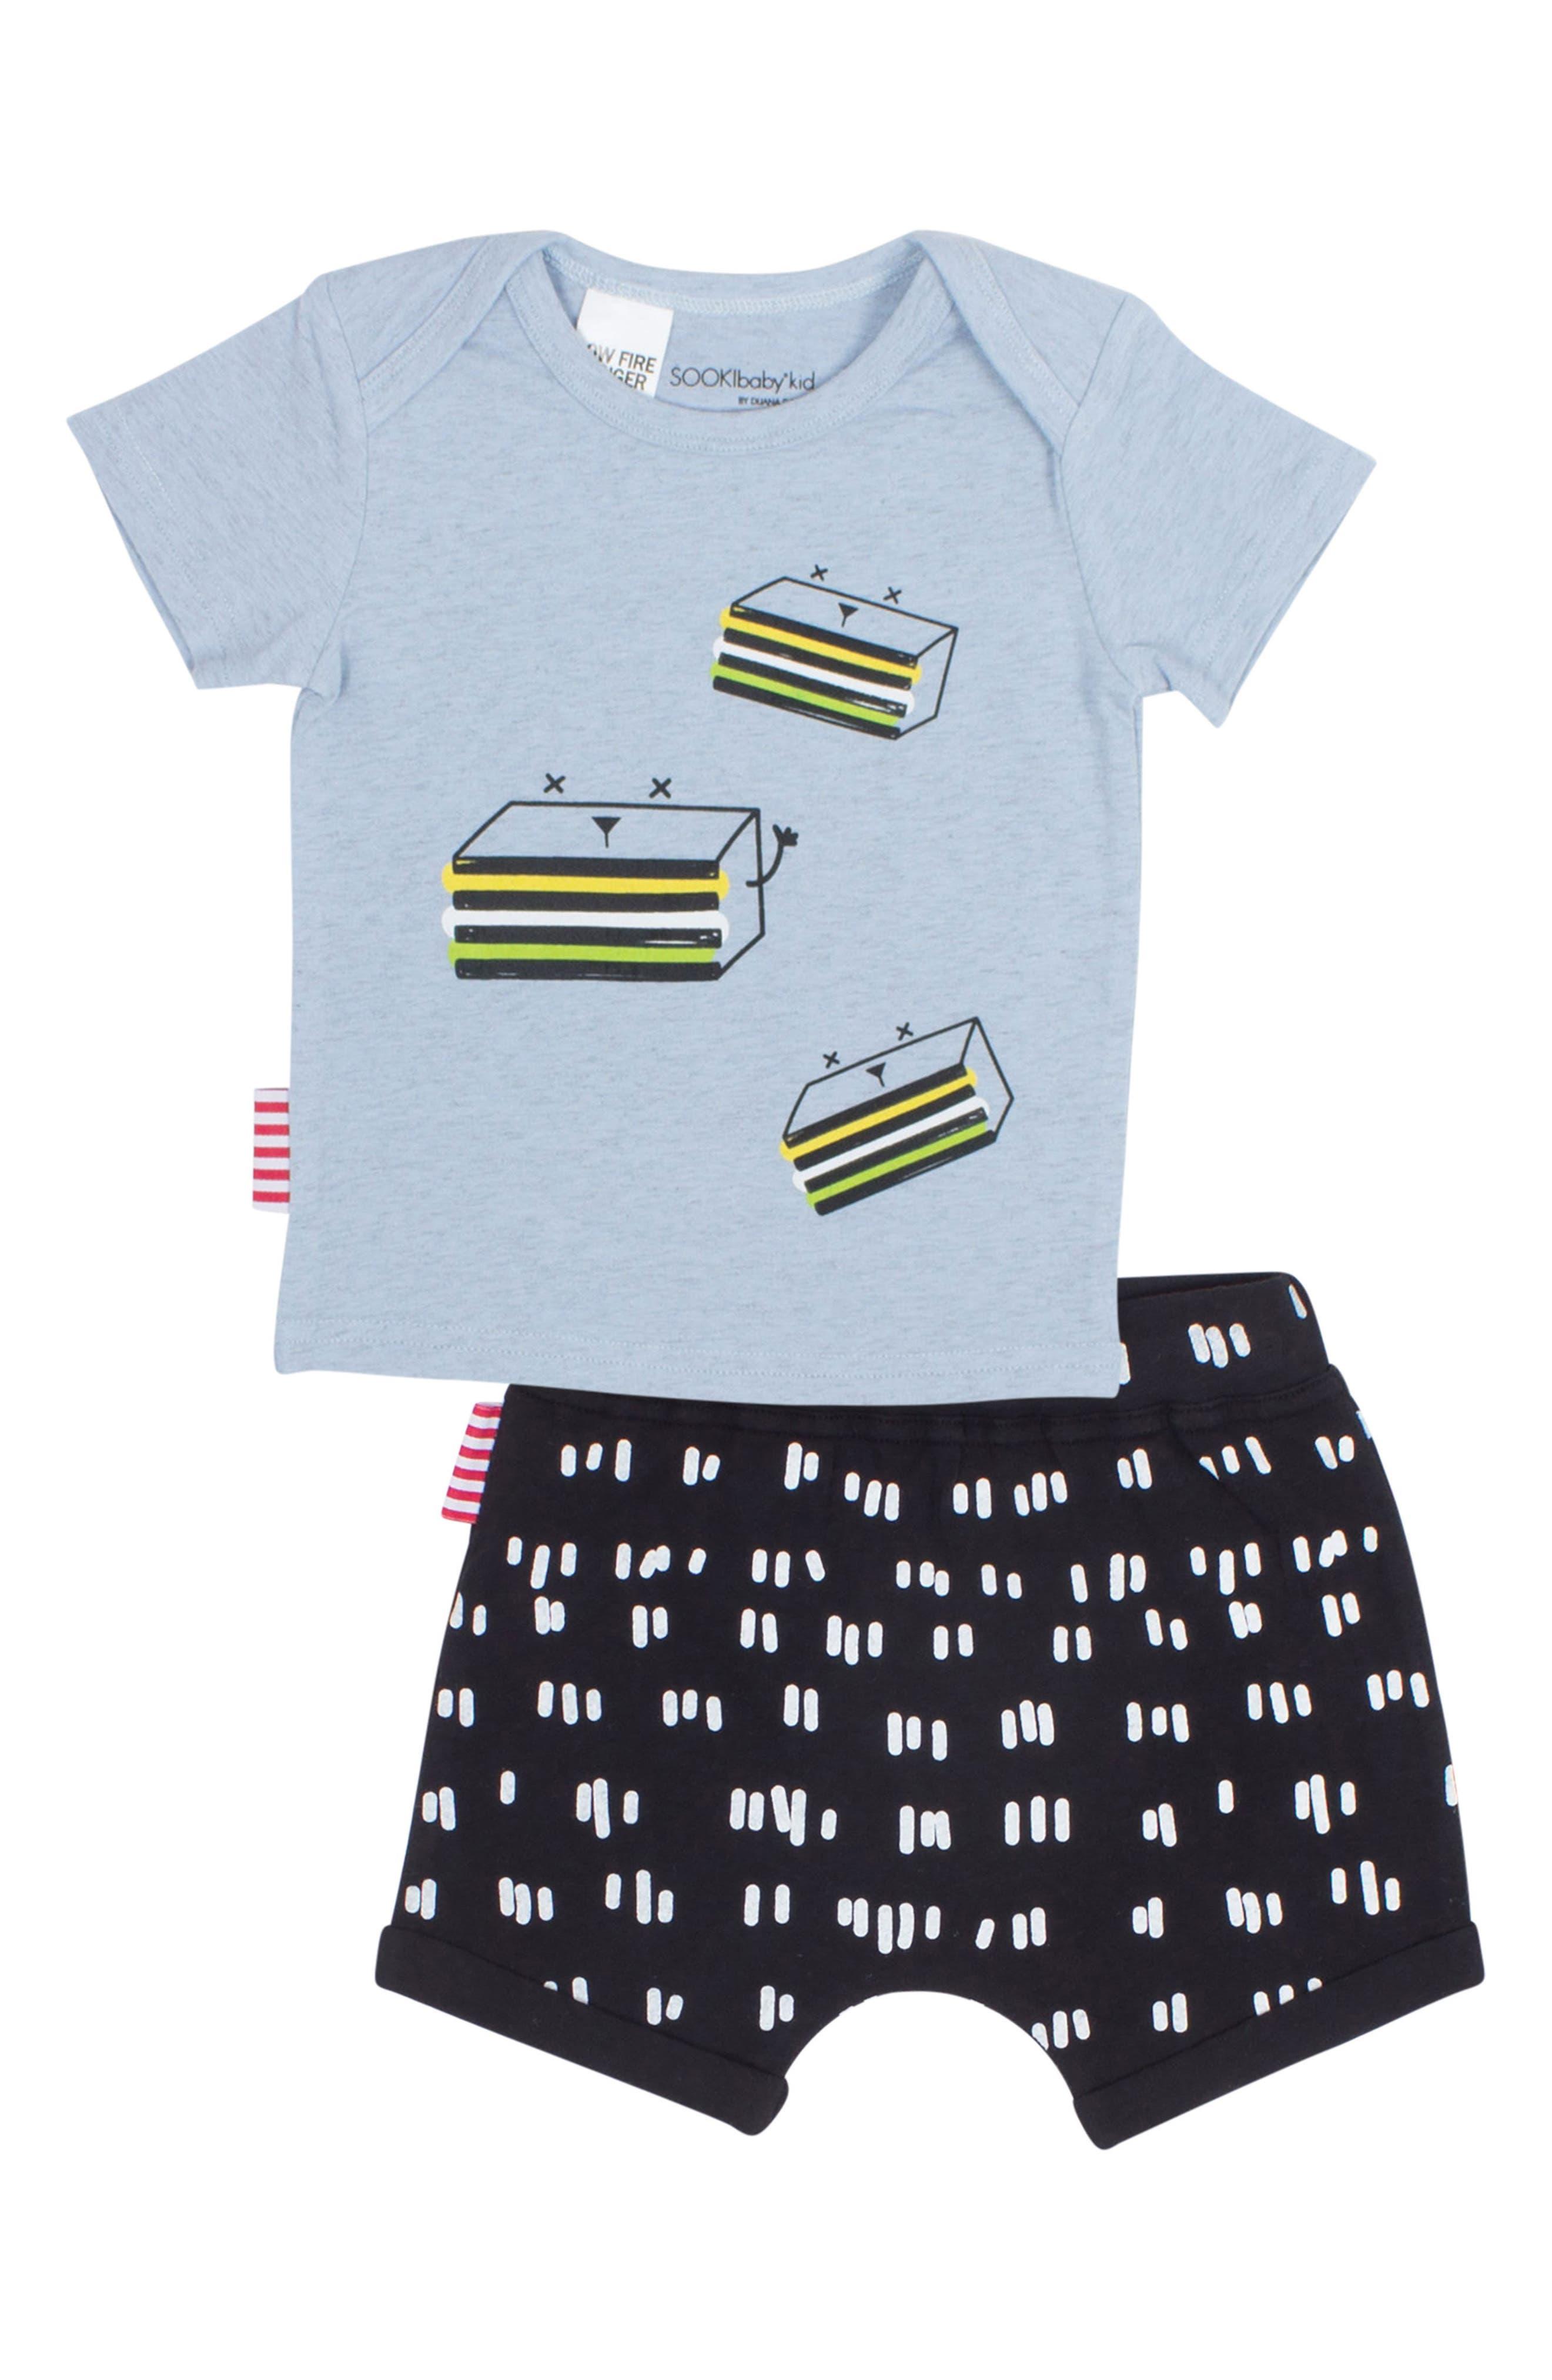 SOOKIbaby Licorice T-Shirt & Shorts Set (Baby & Toddler)